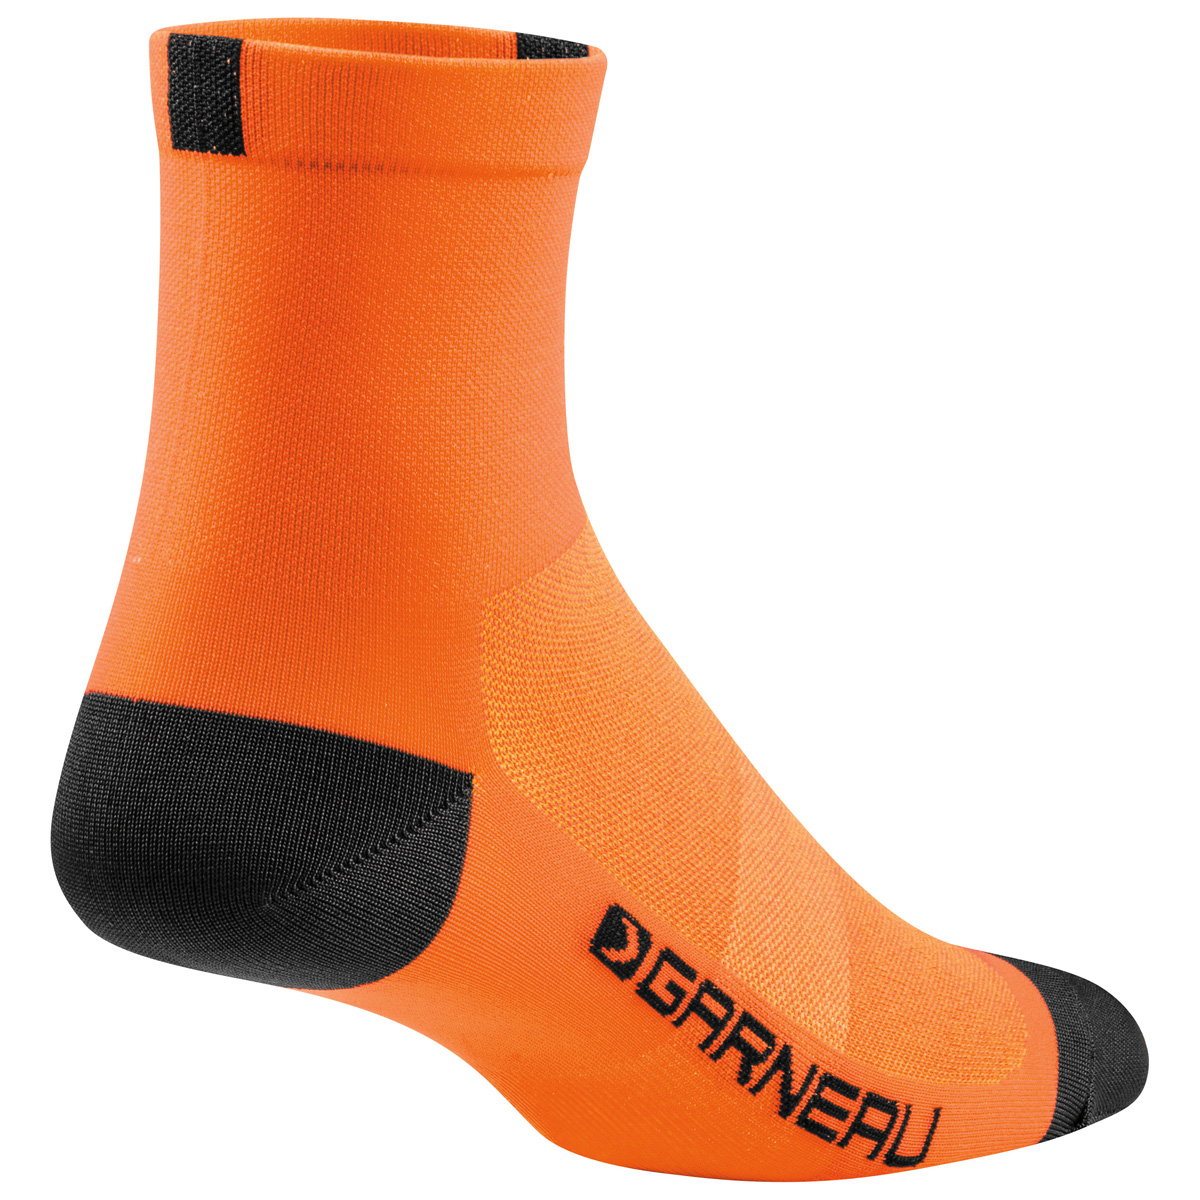 Louis-Garneau-2017-18-Conti-Cycling-Running-Socks-1085057